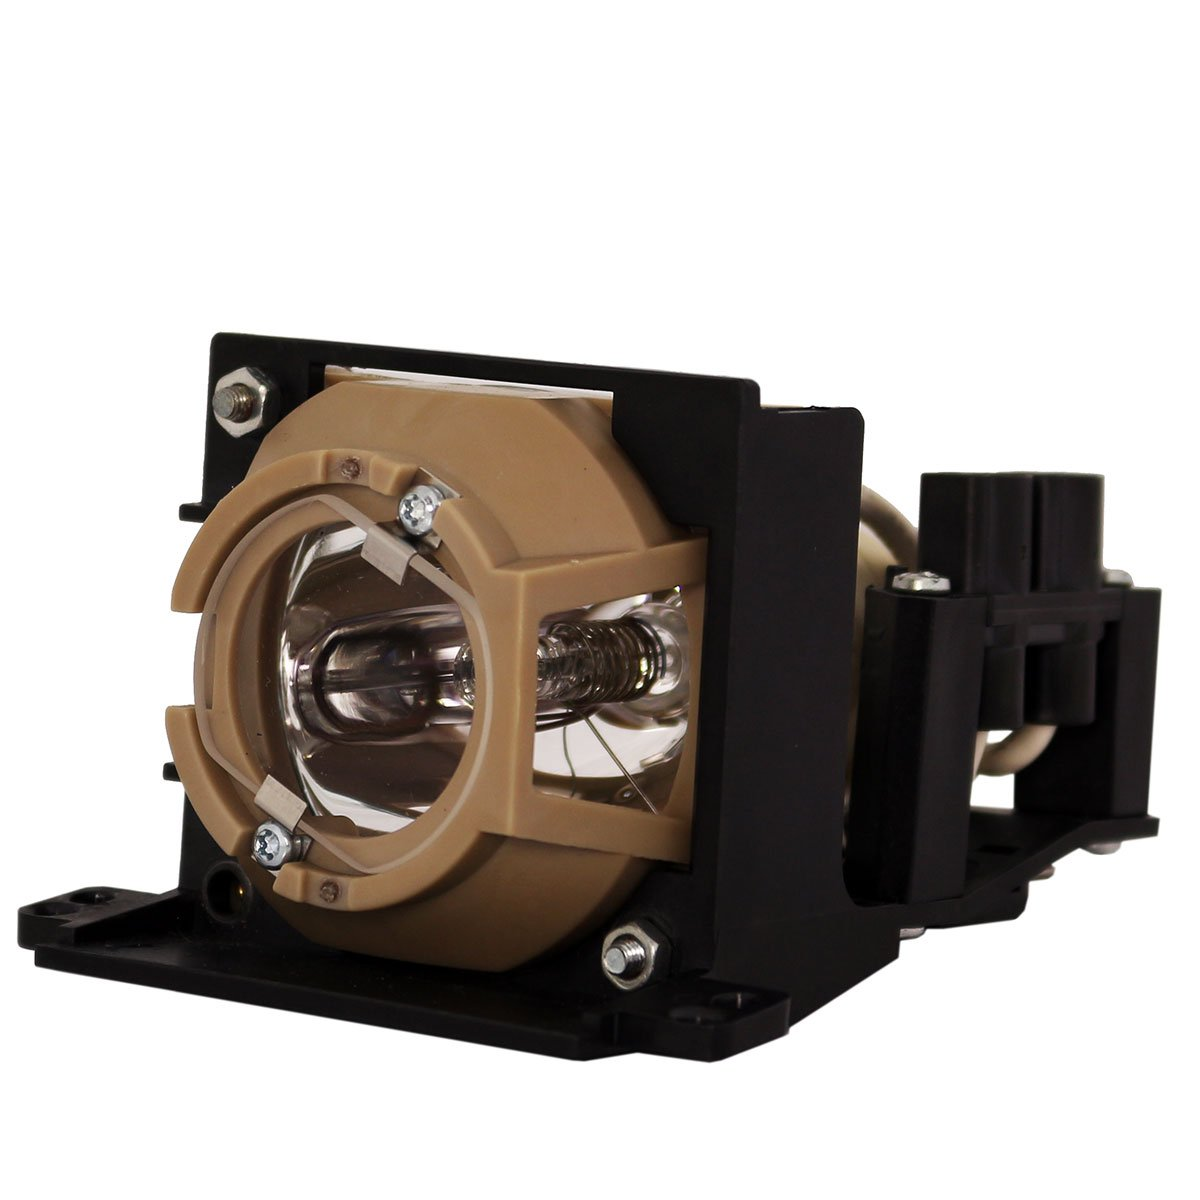 SpArc 交換用プロジェクターランプ 囲い/電球付き Sharp PG-M15X用 Platinum (Brighter/Durable) B07MPWR88M Lamp with Housing Platinum (Brighter/Durable)